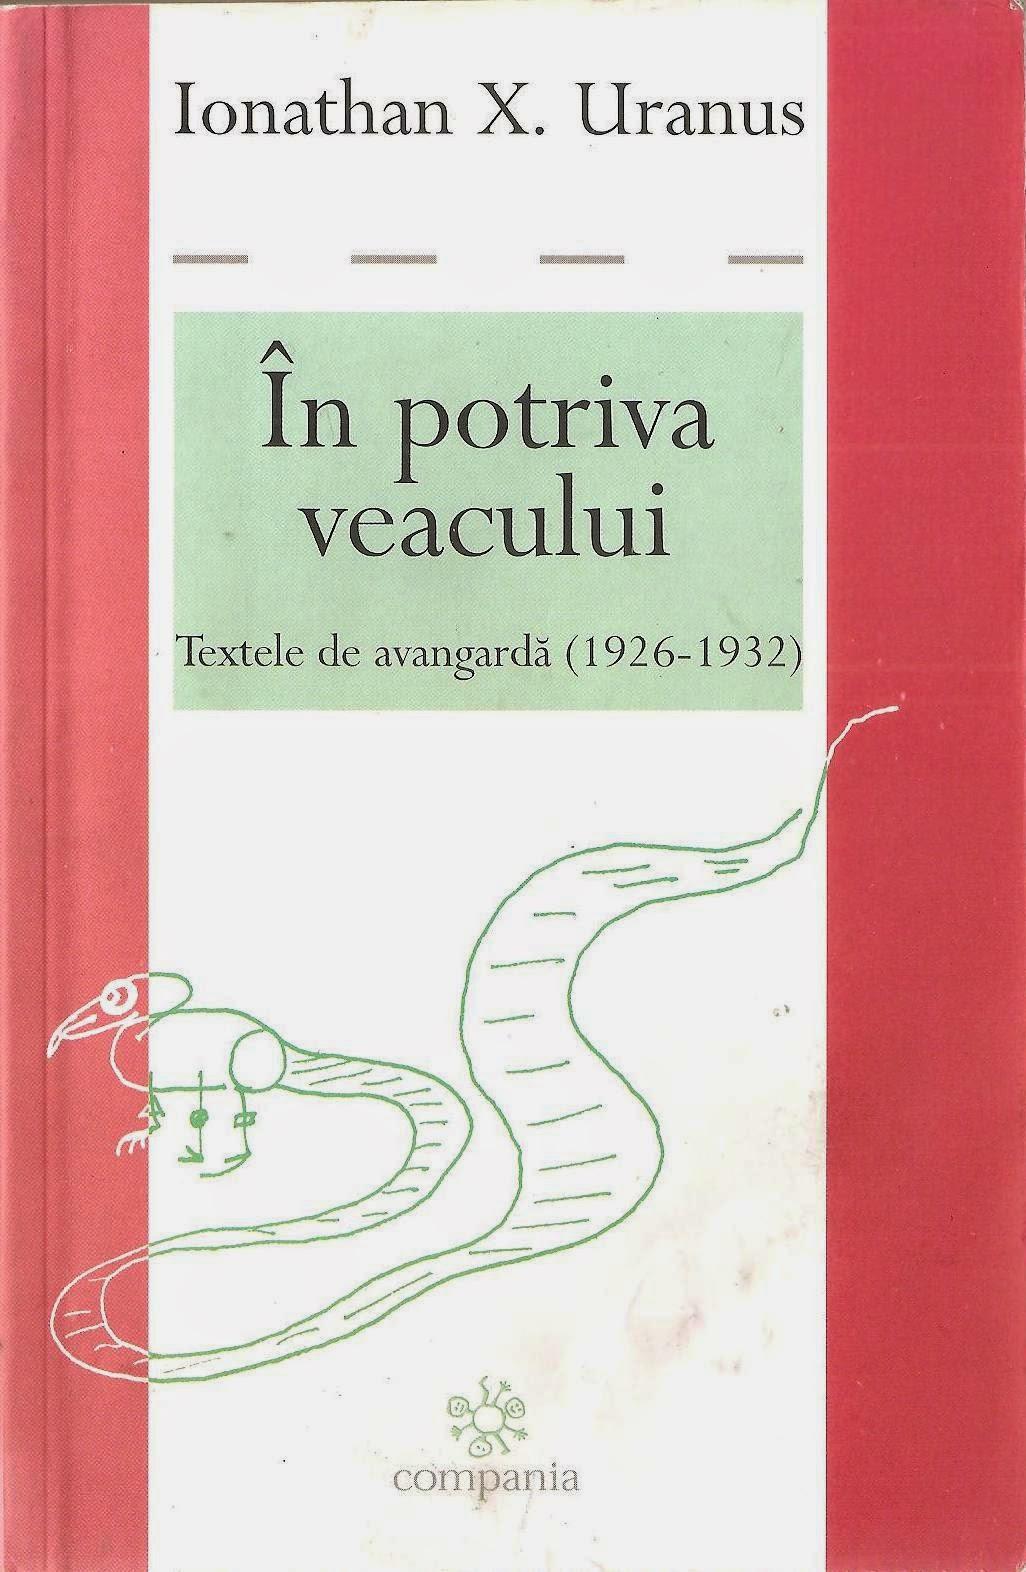 Ionathan X. Uranus poet roman, carti de avangarda, autor avangardist